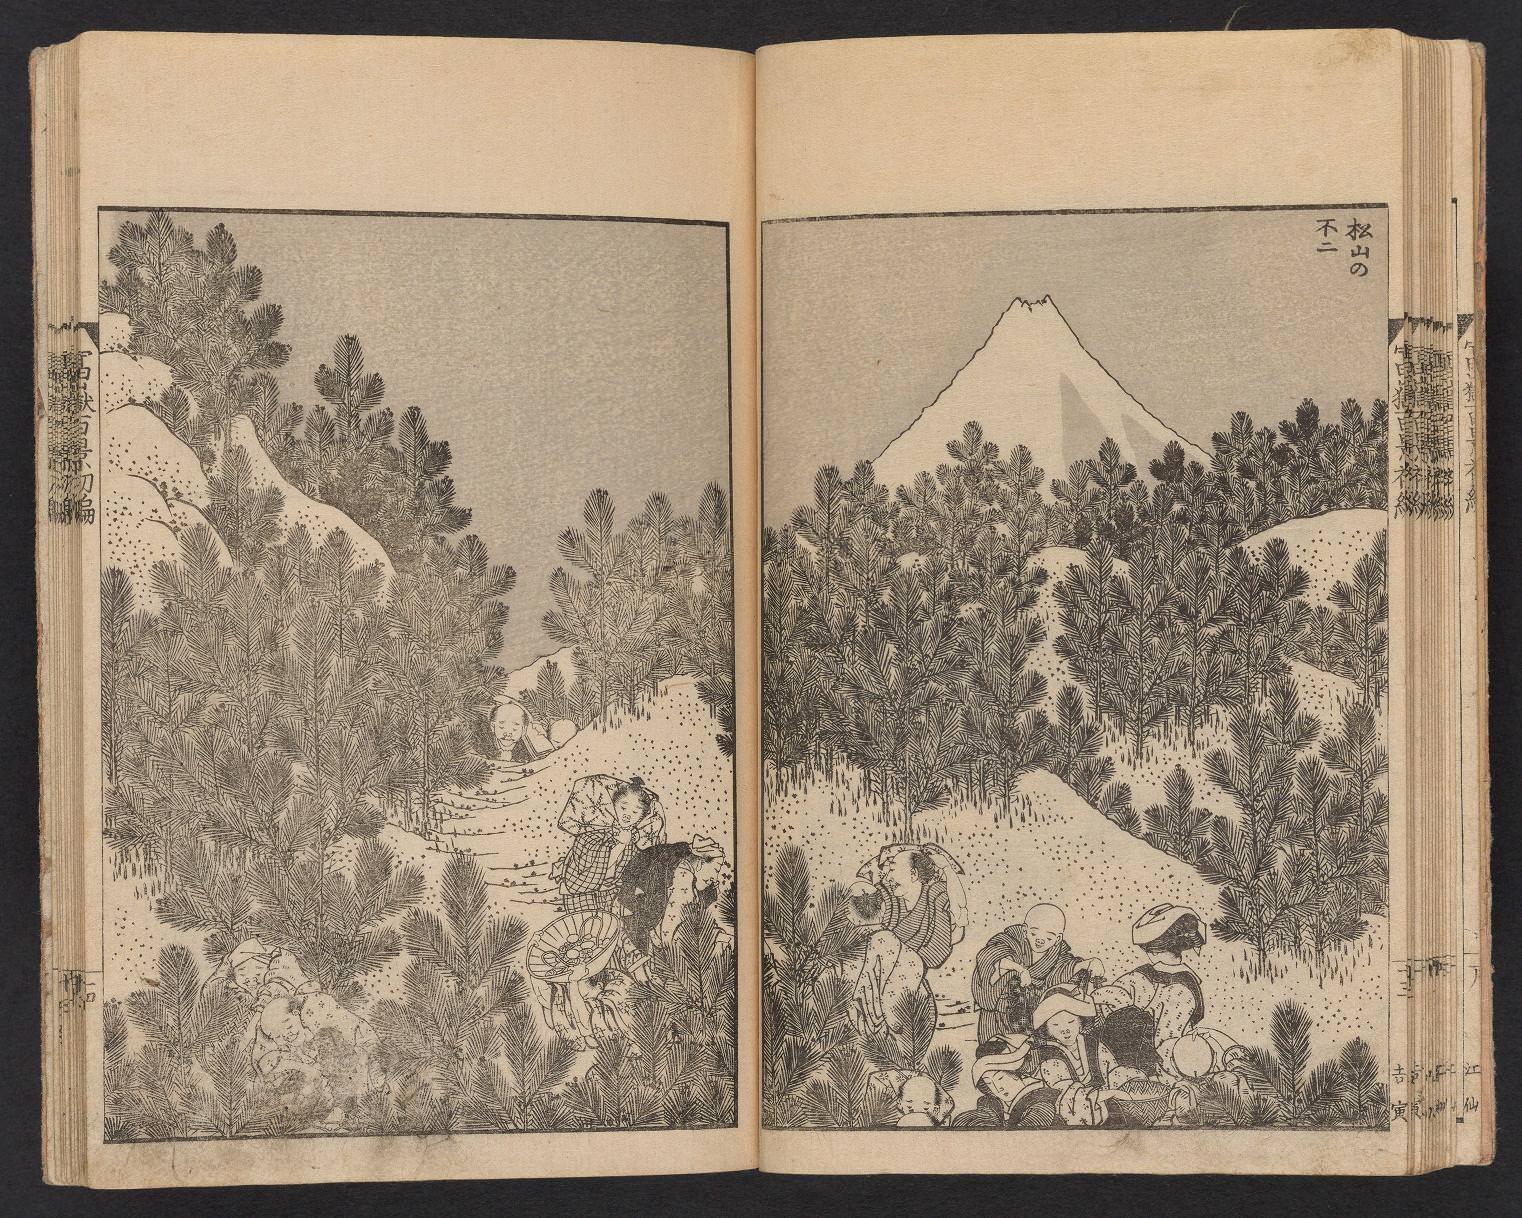 libri-illustrati-giapponesi-smithsonian-02